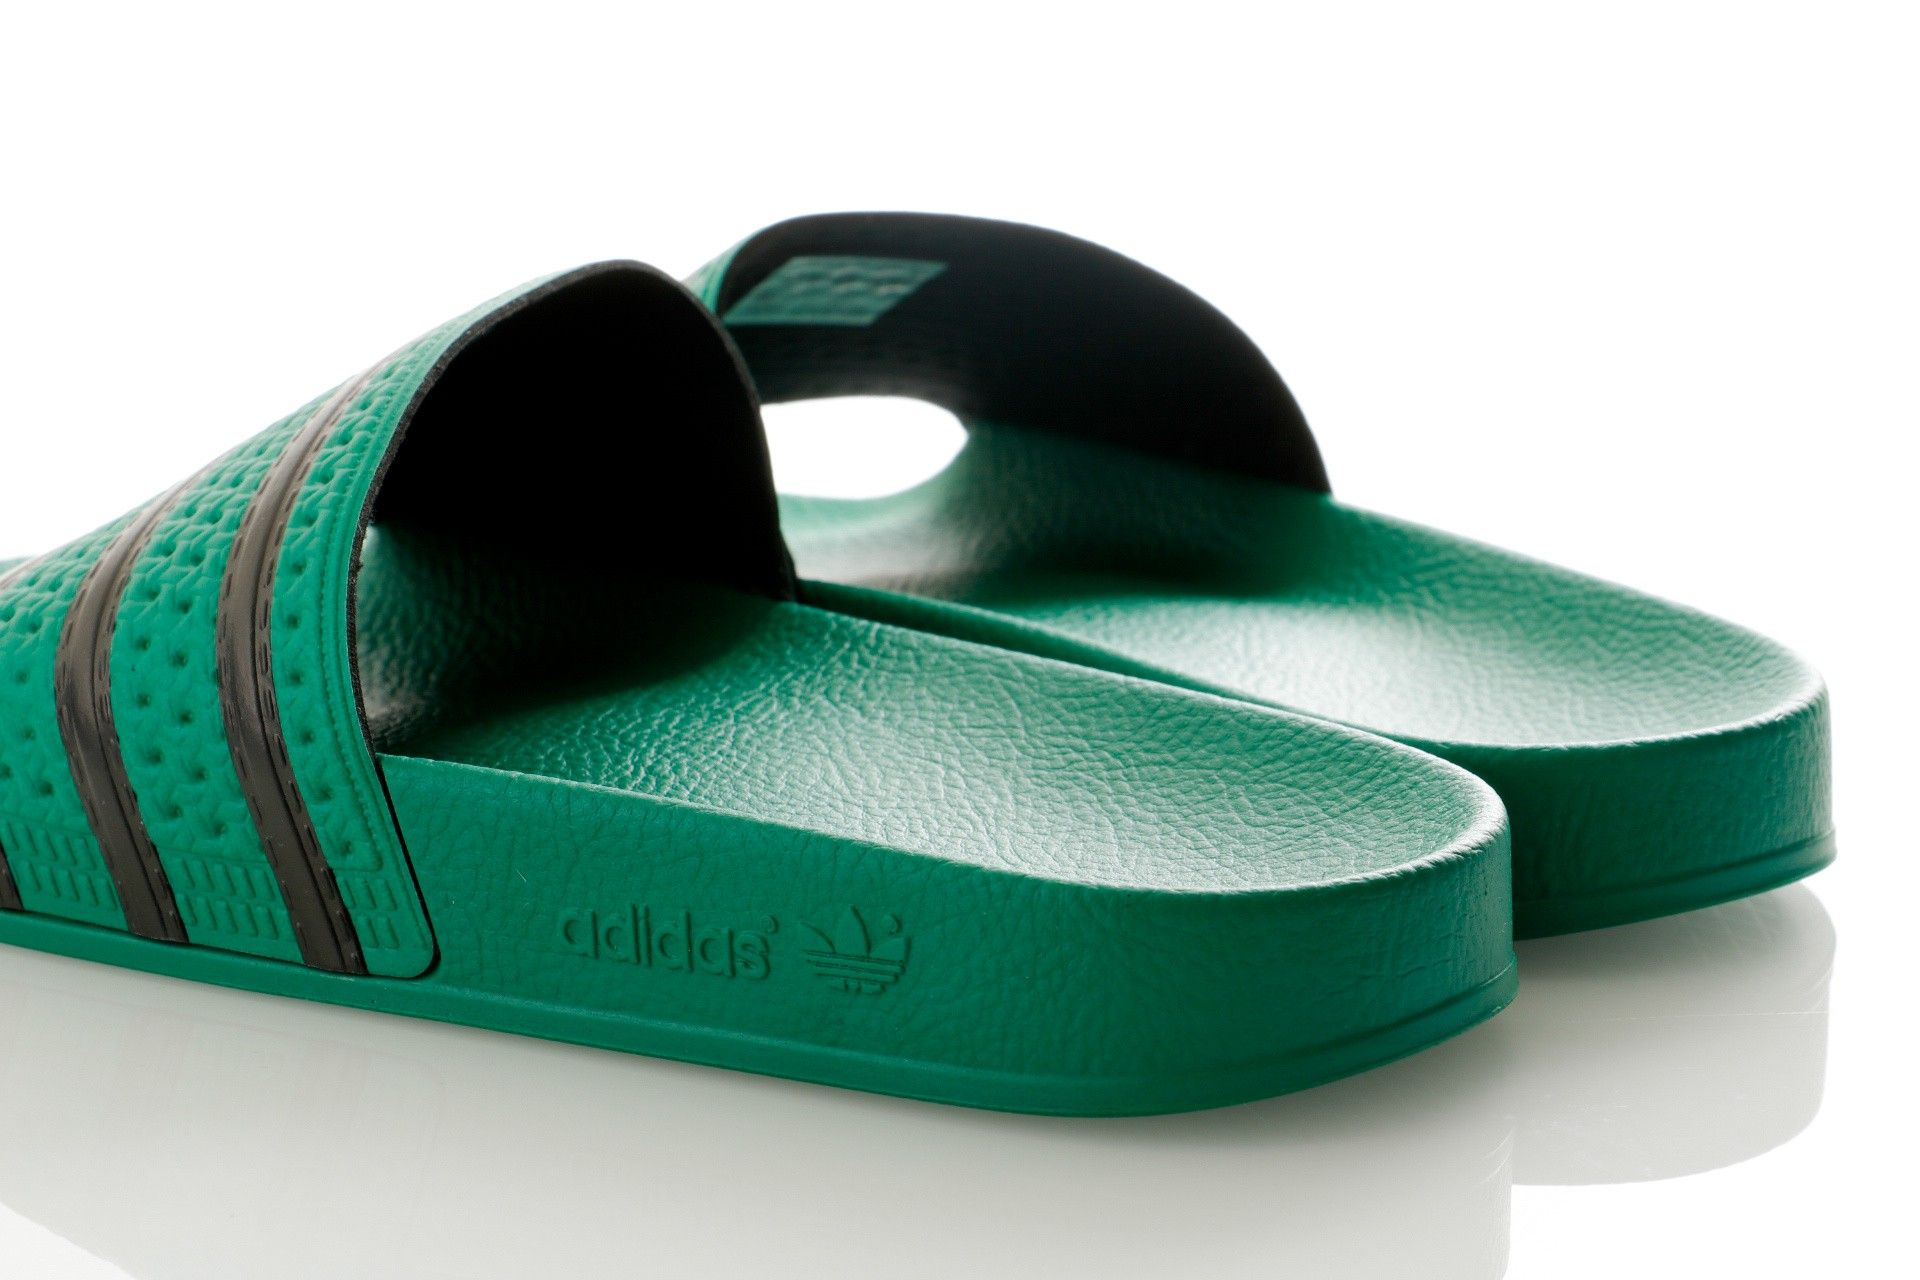 Adidas Adilette Cm8443 Slipper Bold GreenCore BlackBold Green